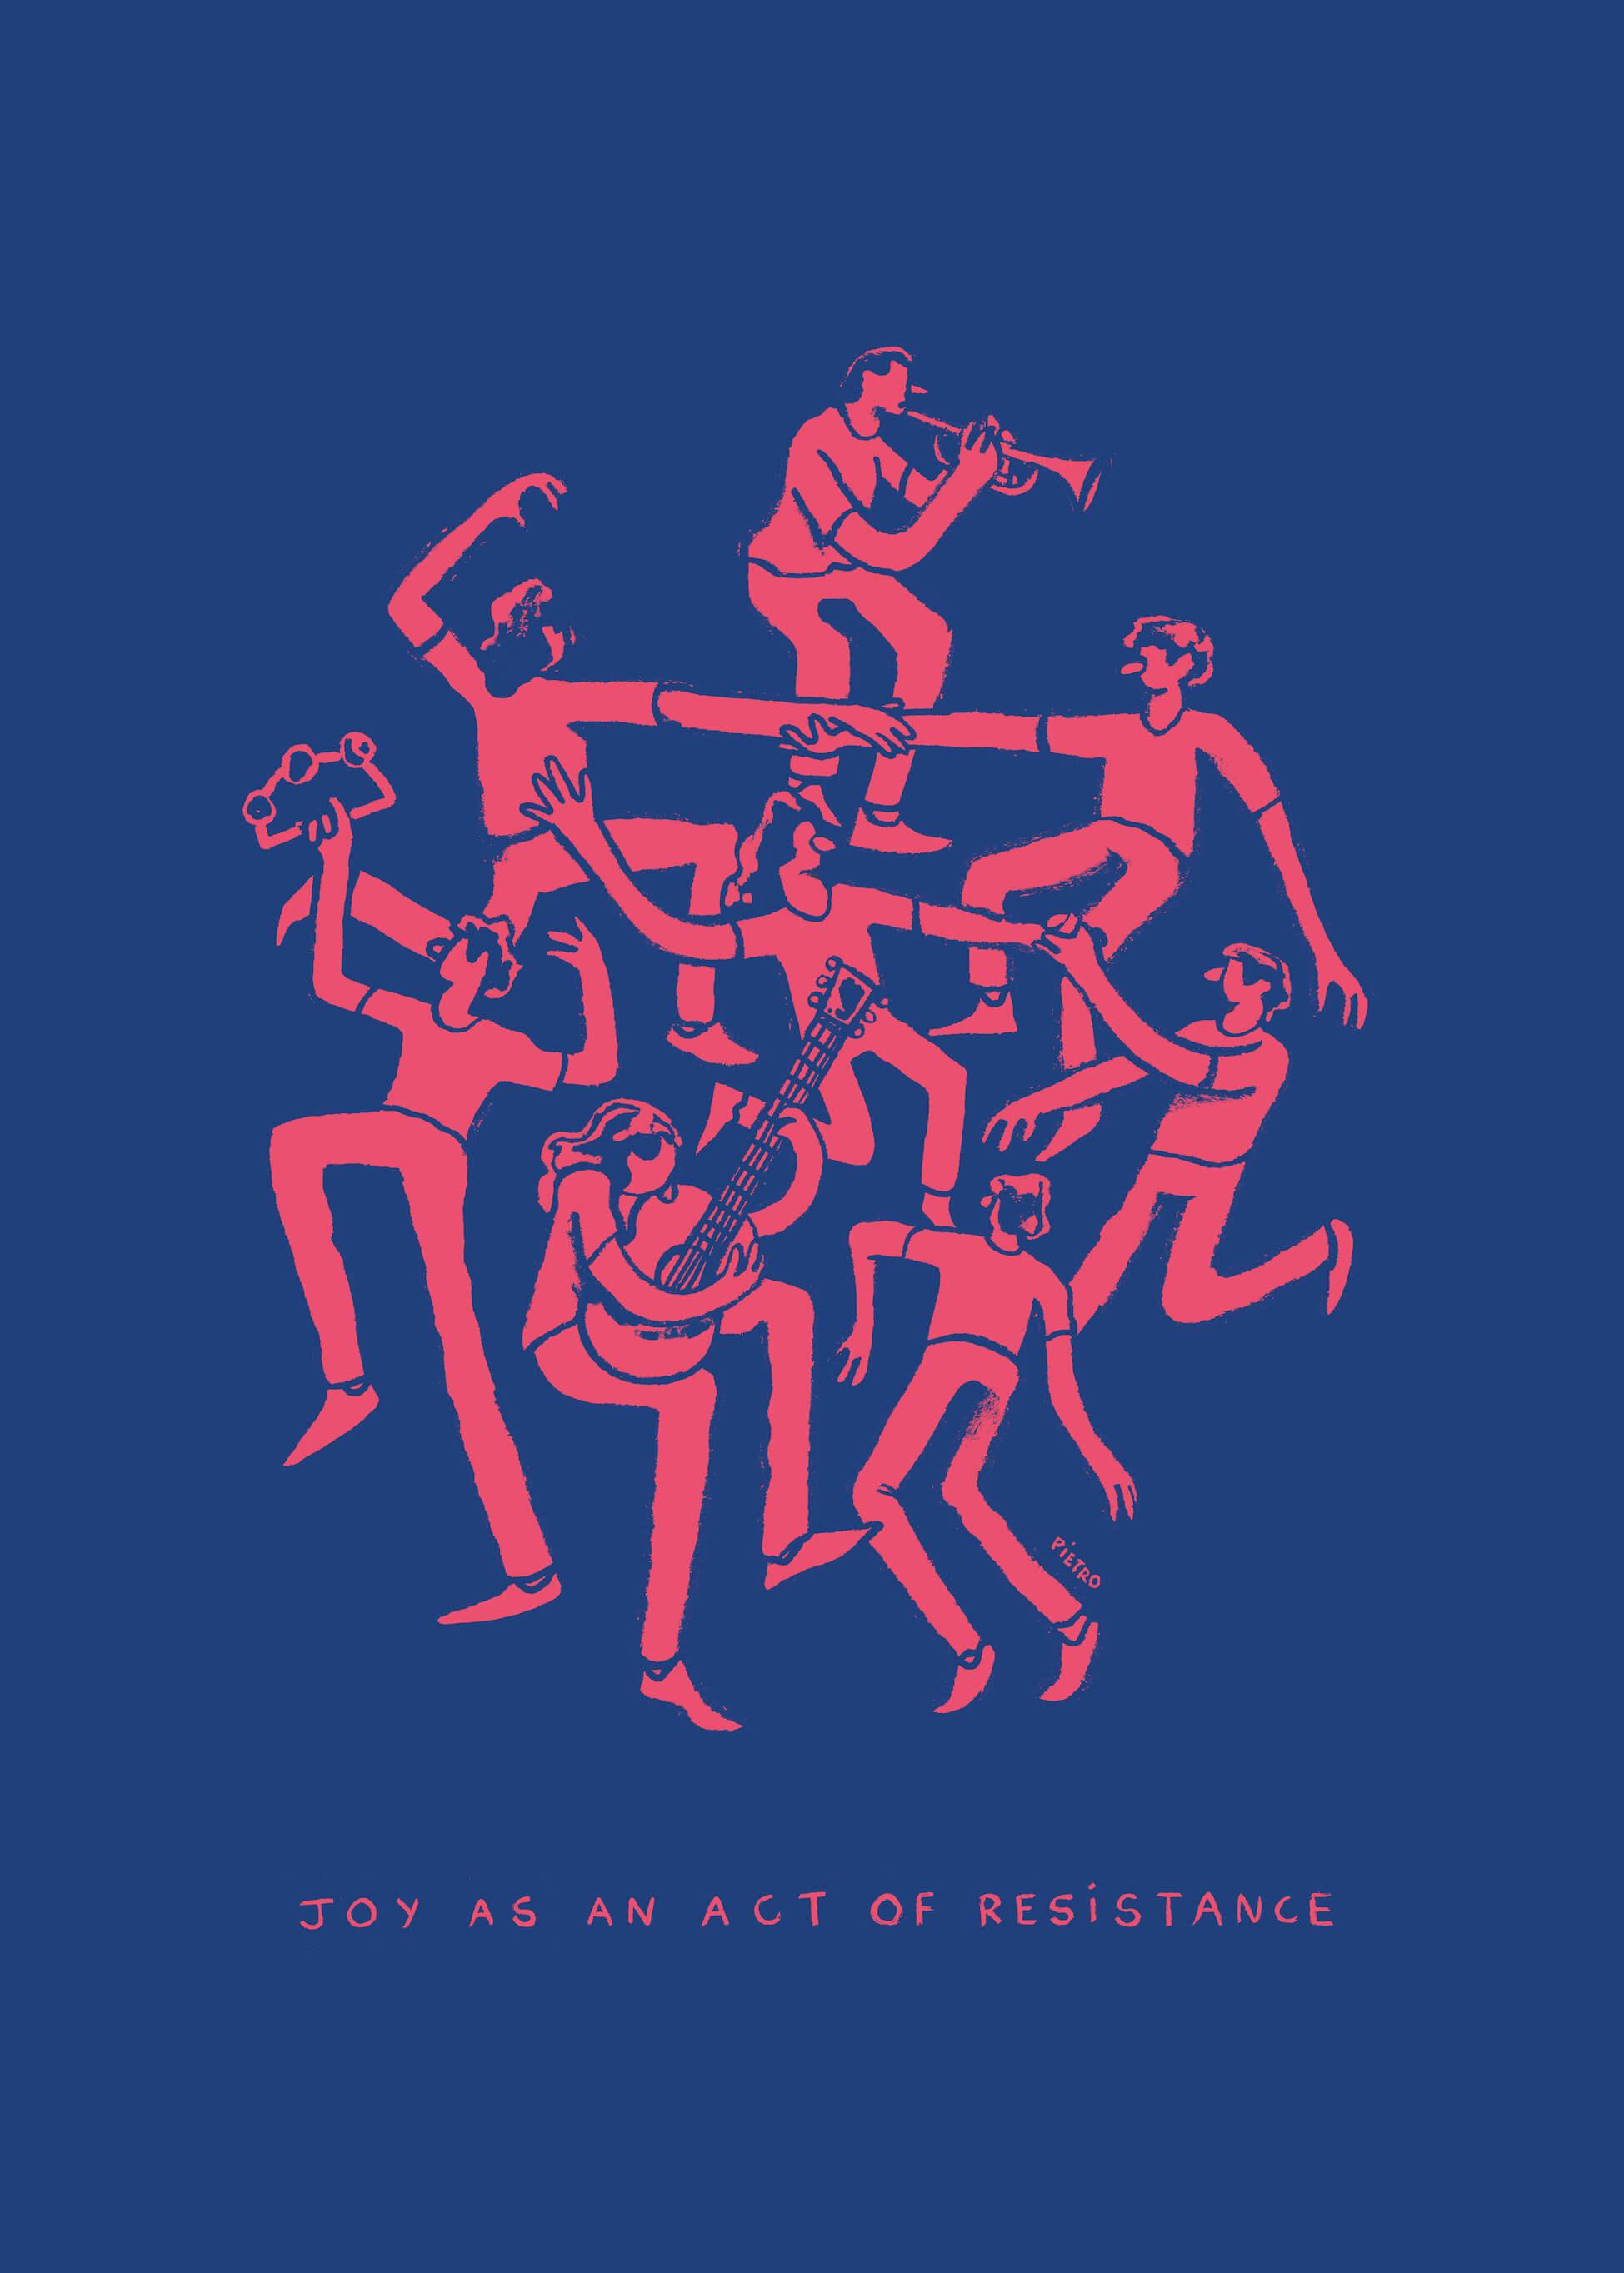 Joy As An Act Of Resistance (alternate version) main image